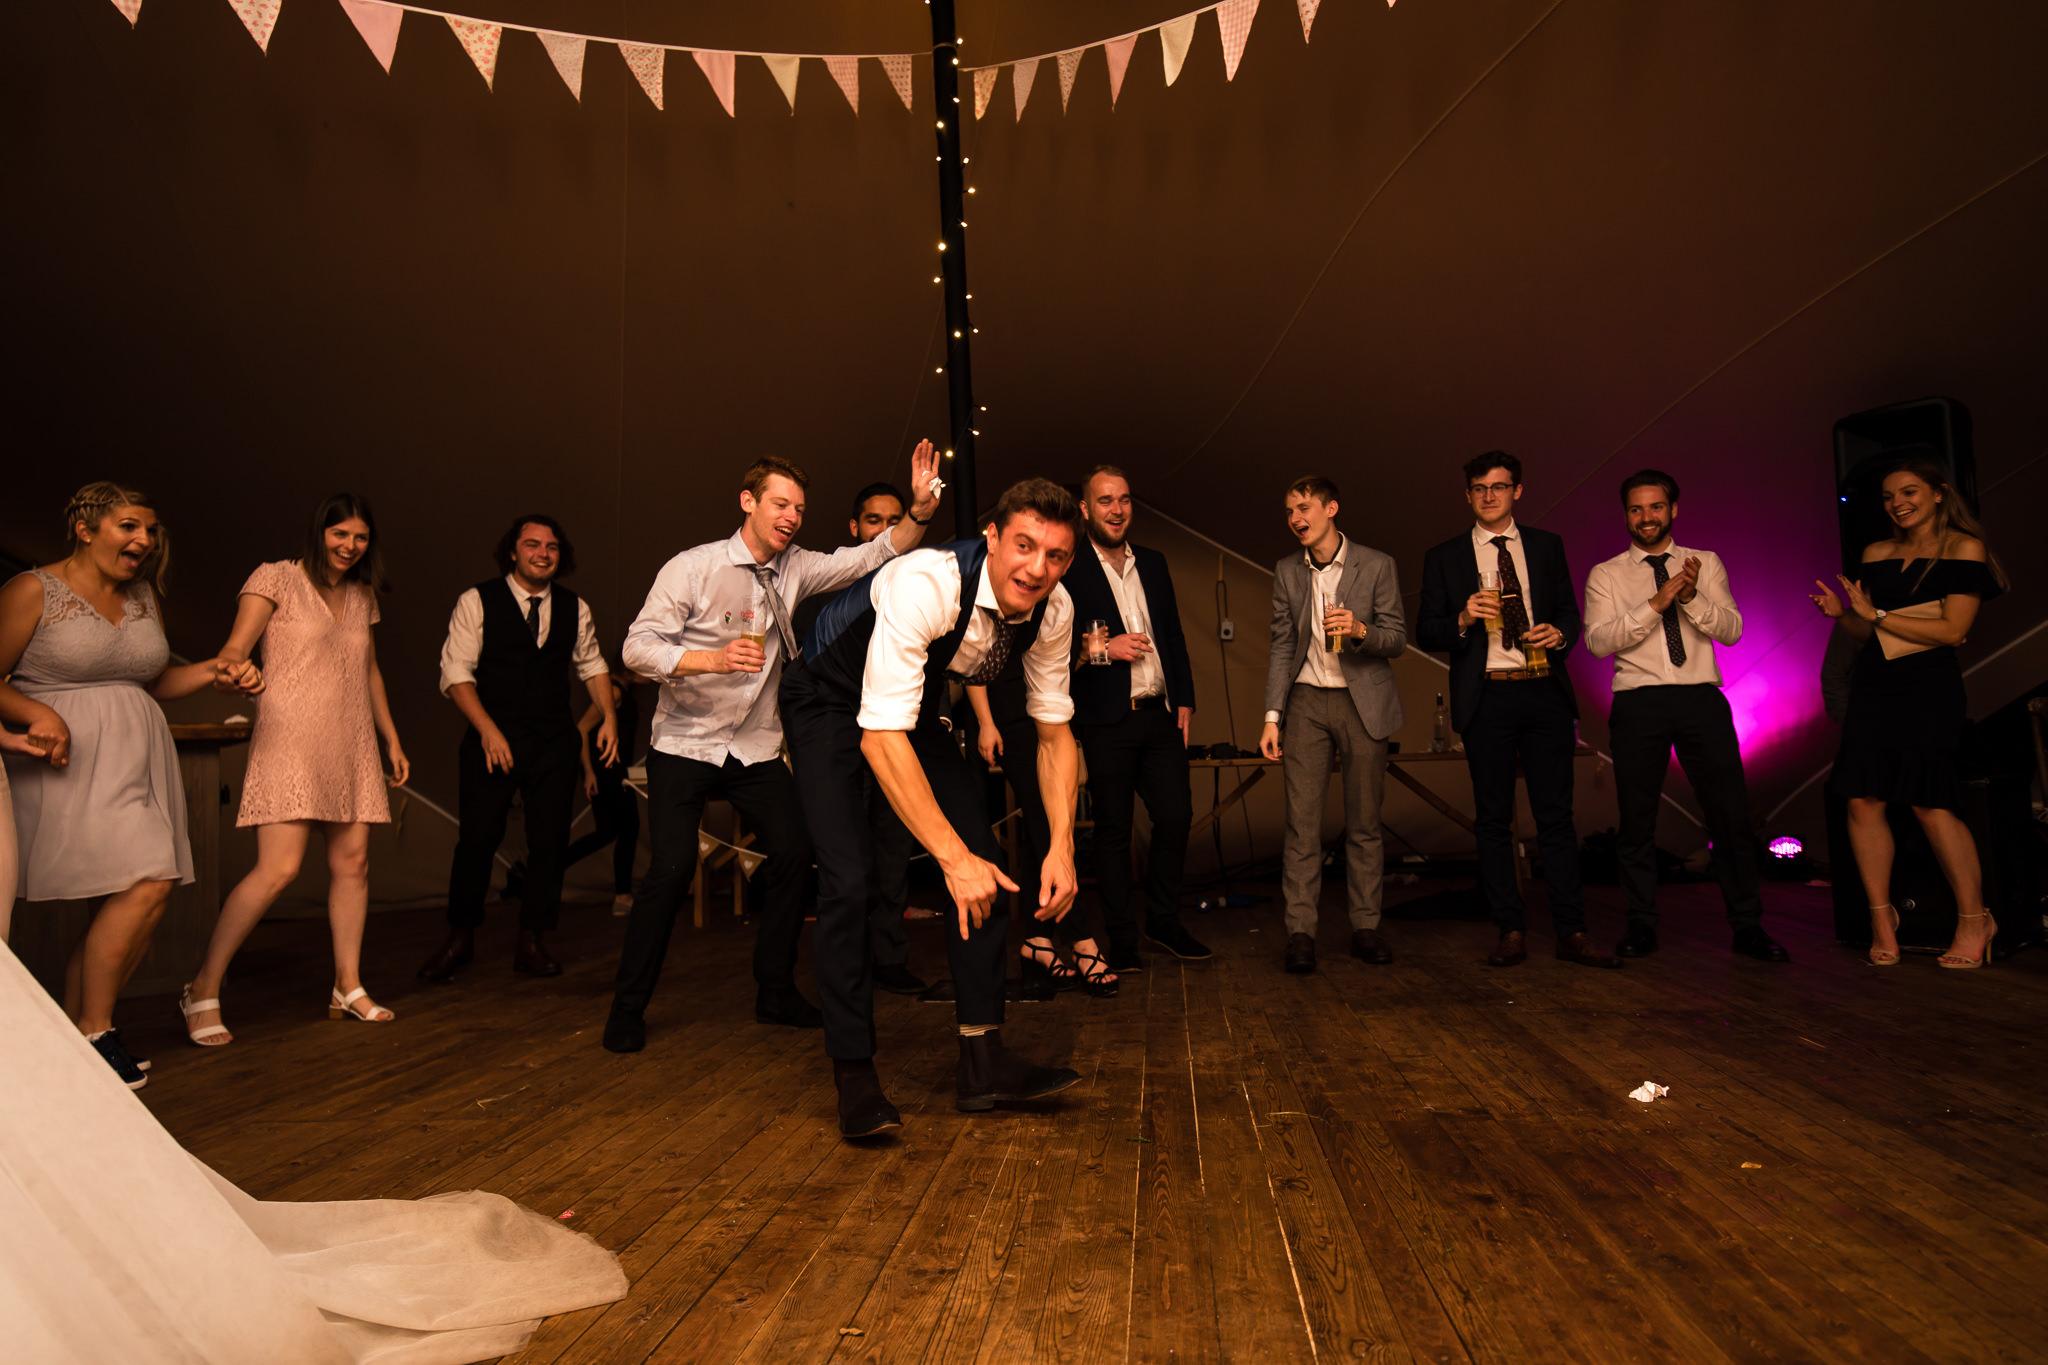 nottingham wedding88